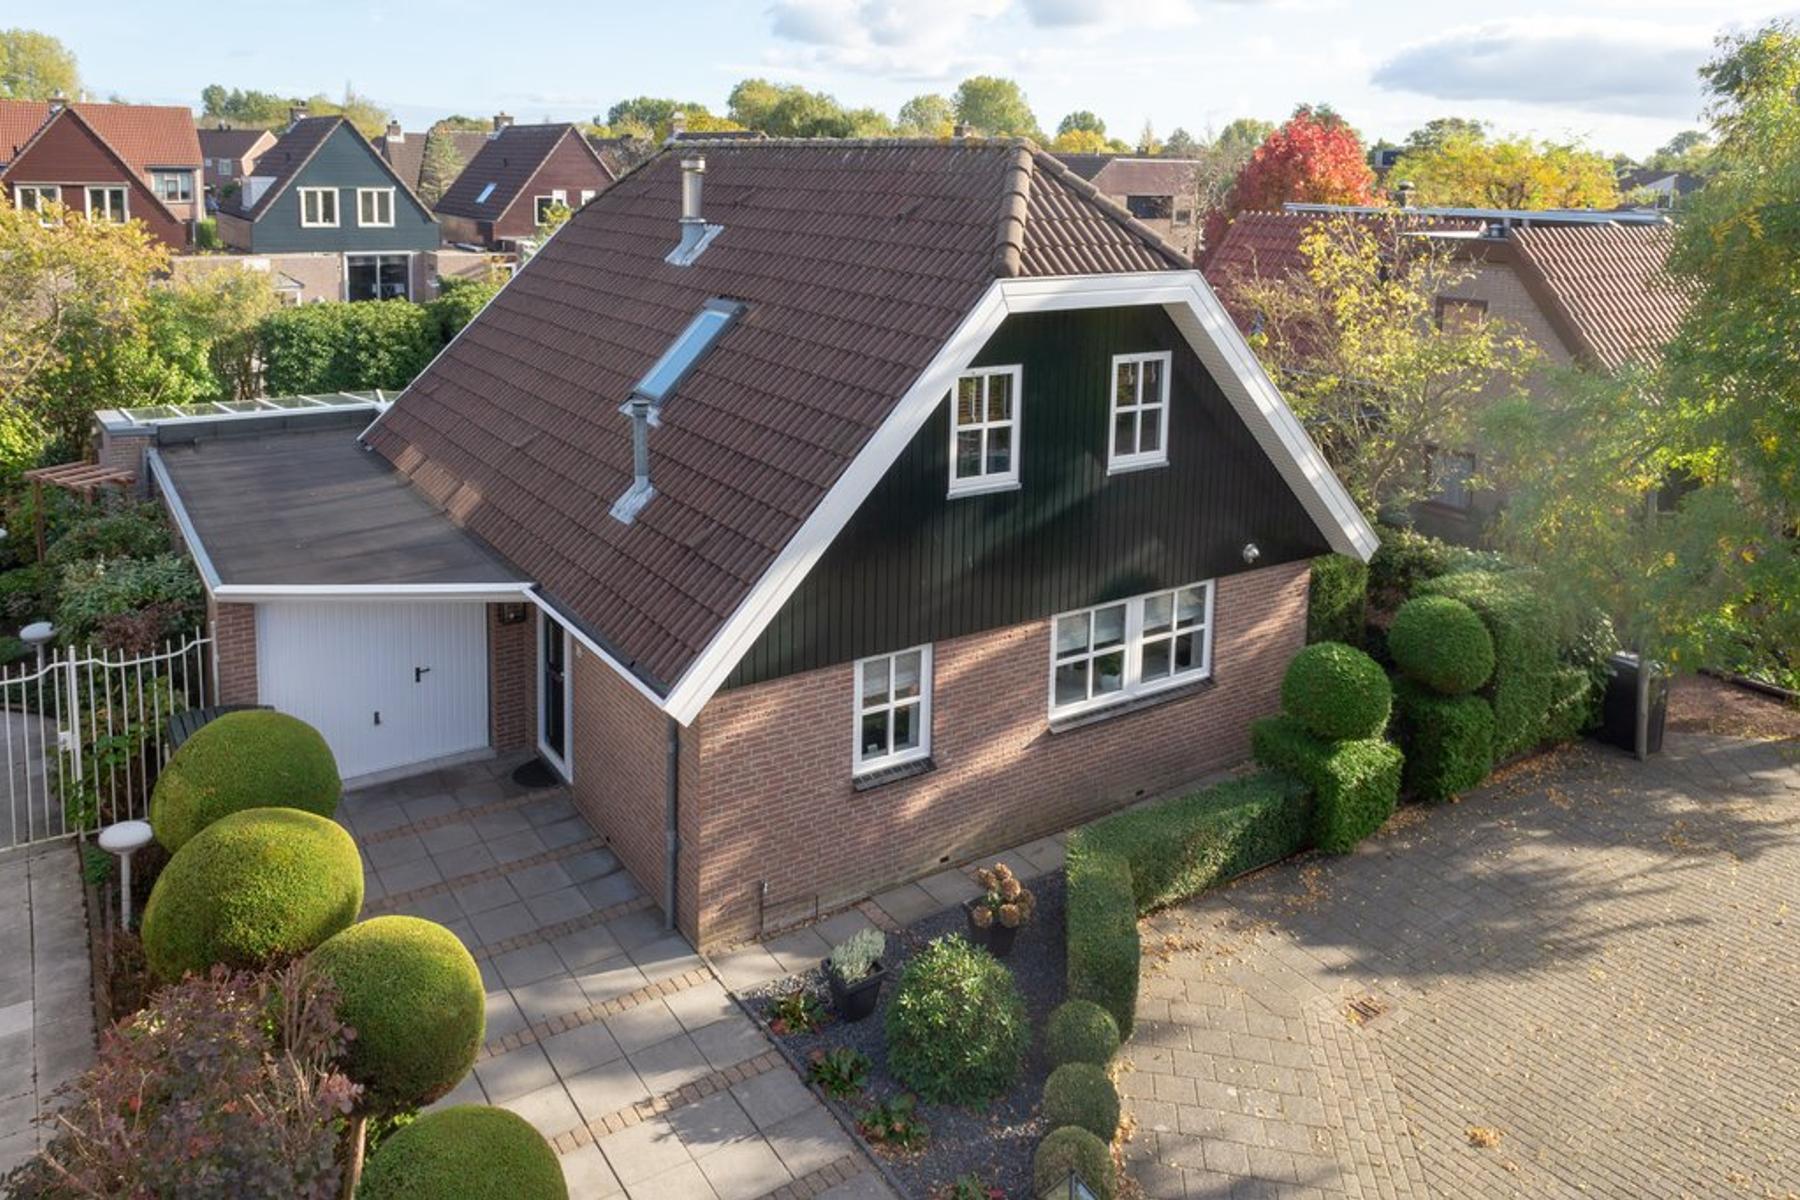 Bladmoshof 19 in Purmerend 1441 LM